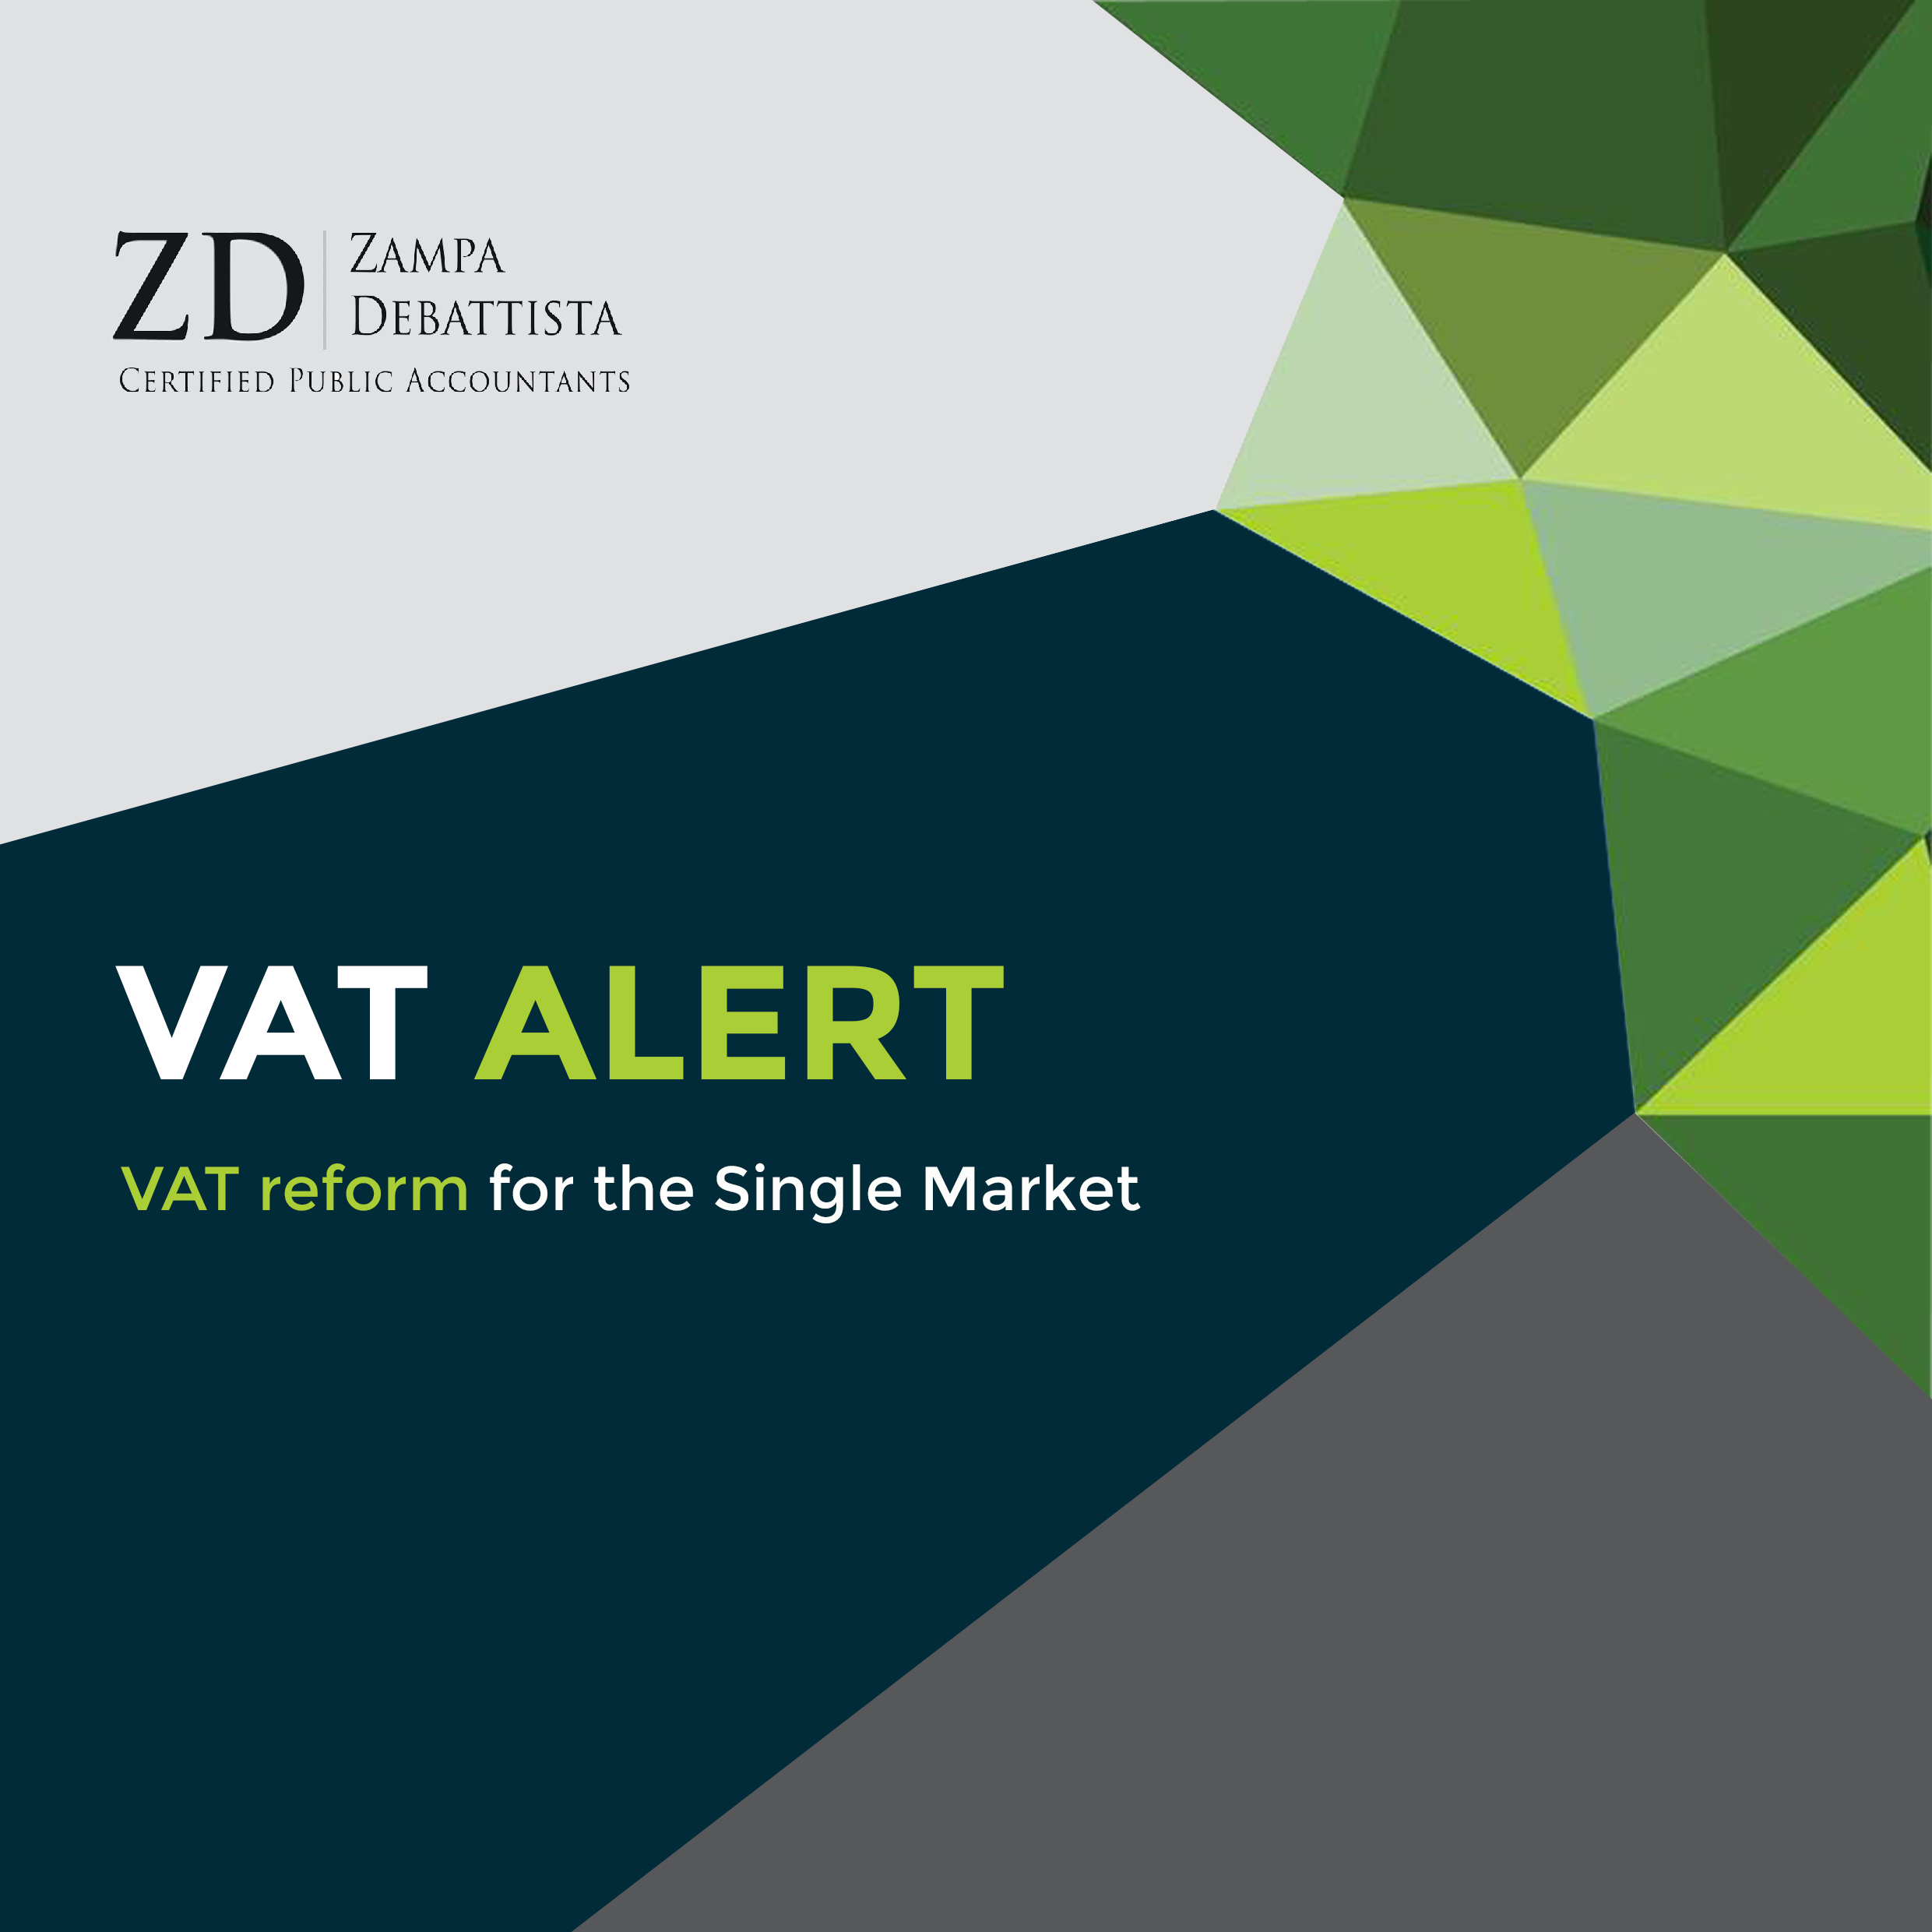 VAT ALERT – VAT reform for the Single Market